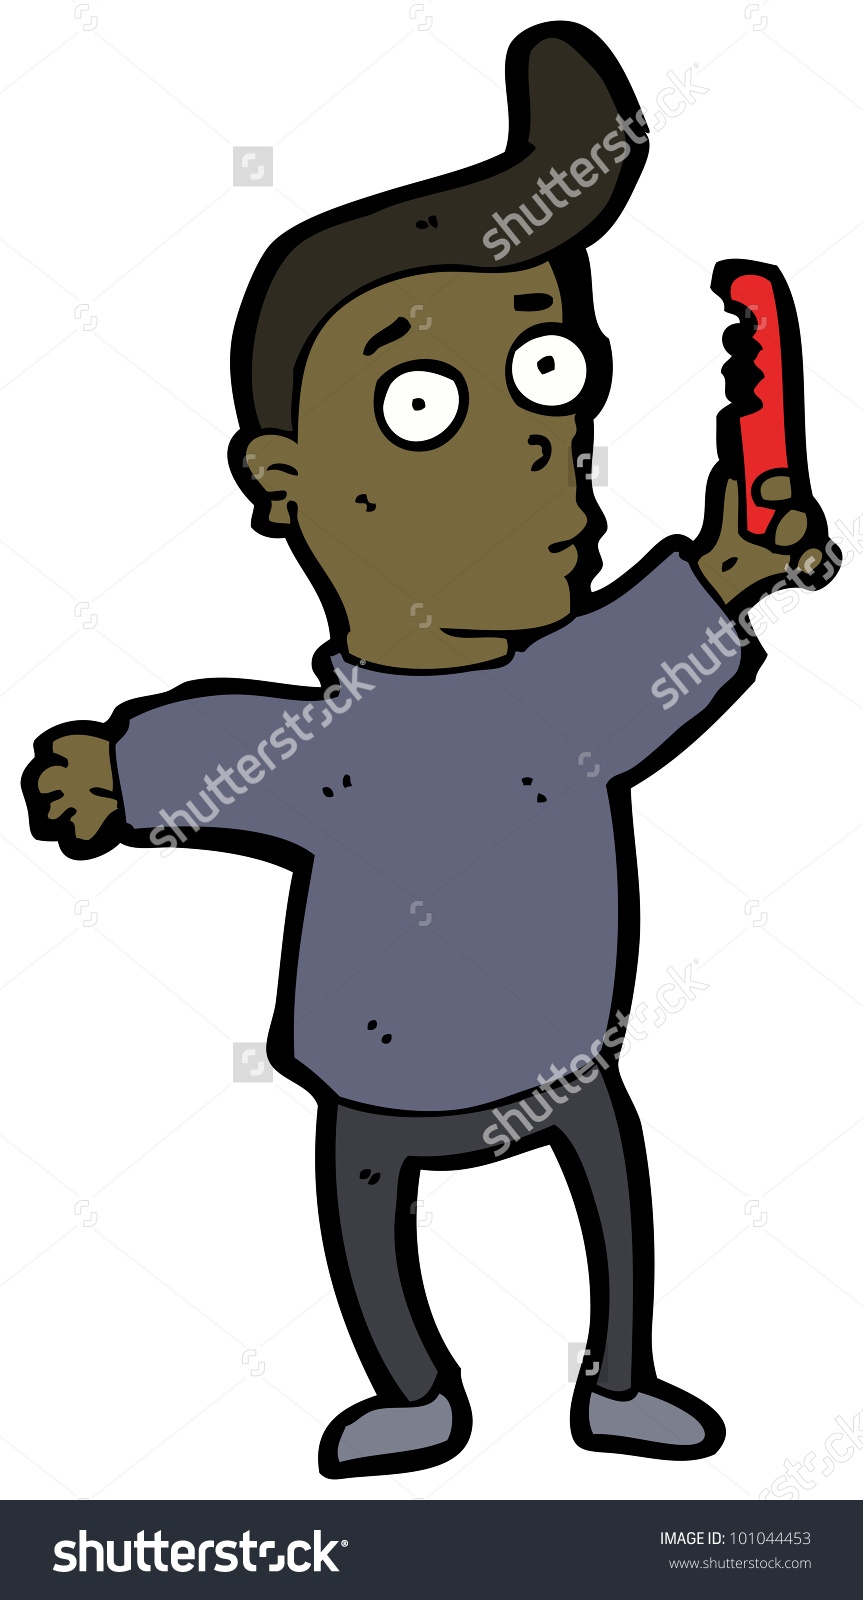 Cartoon Man Combing Hair Stock Photo 101044453 : Shutterstock.